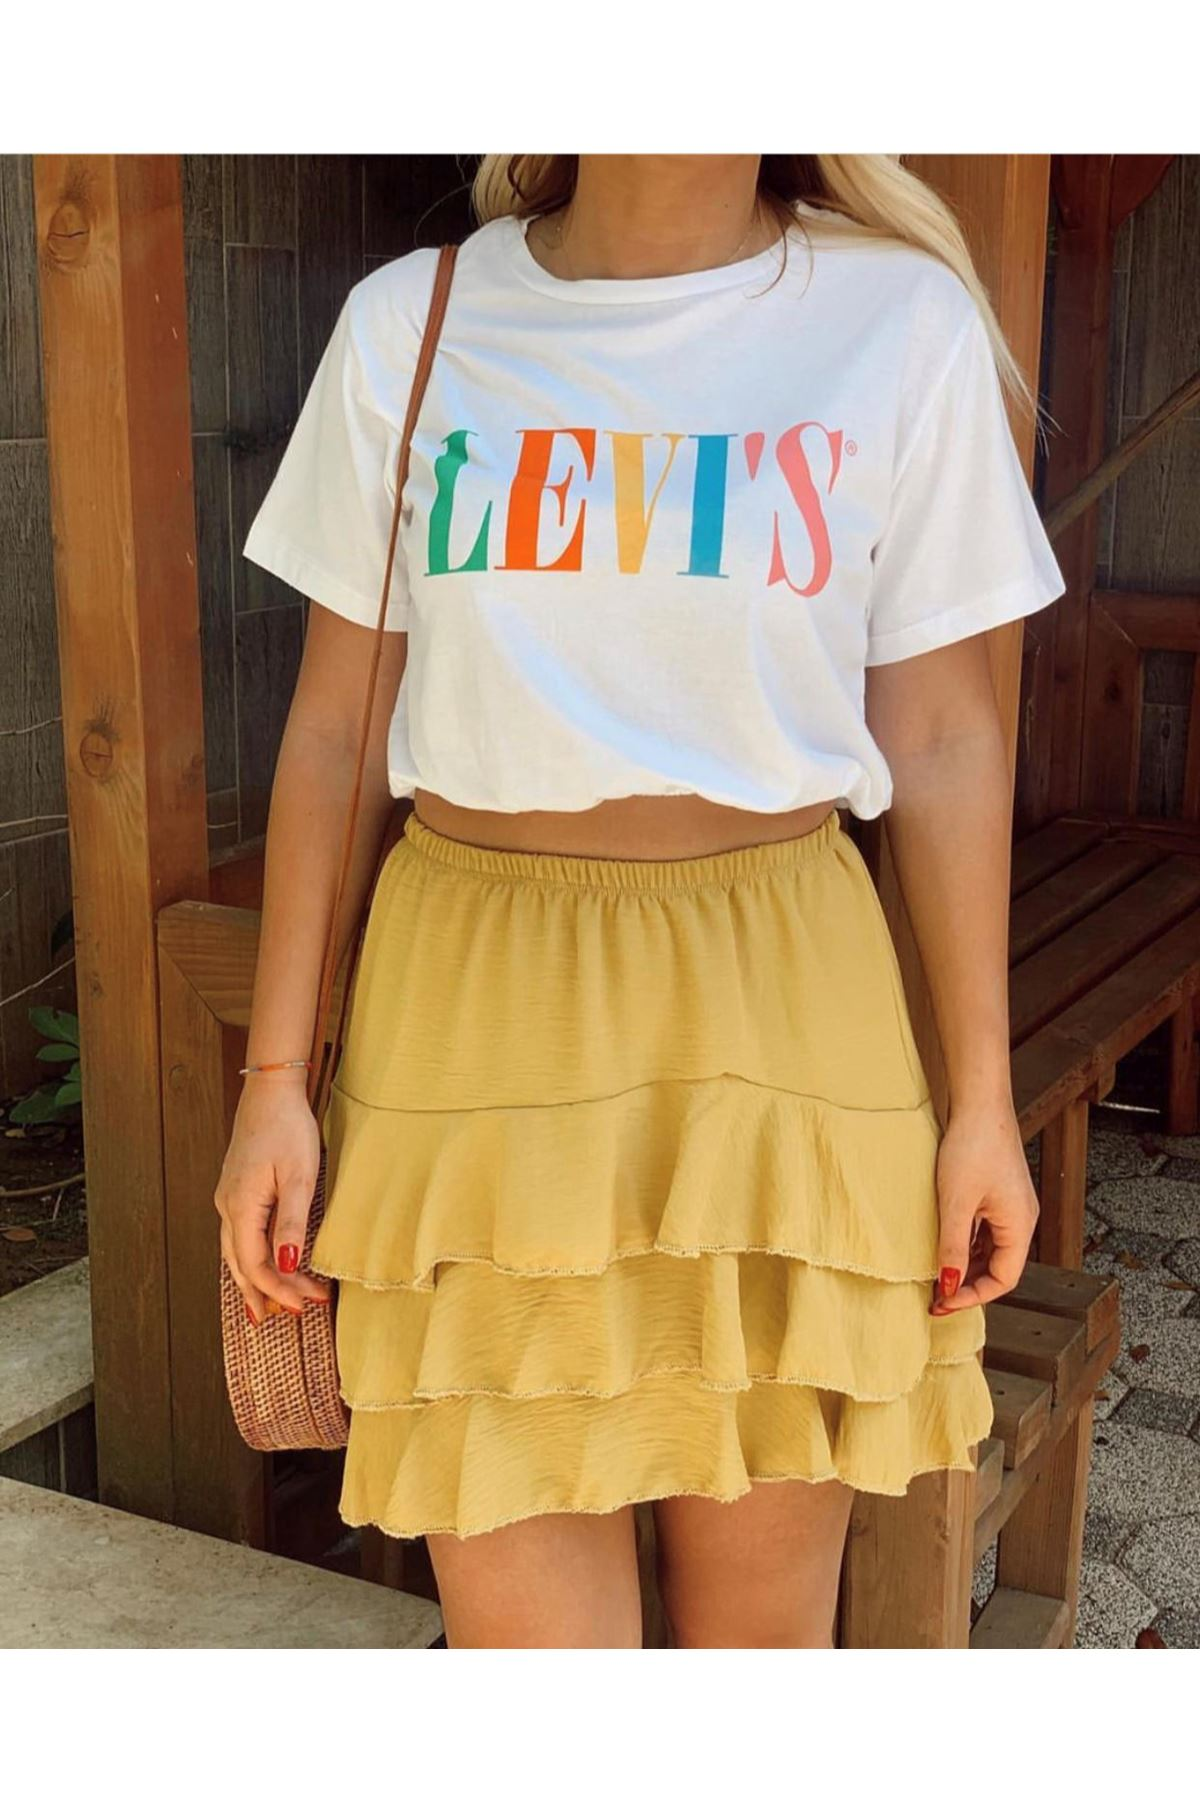 Levis beyaz tshirt